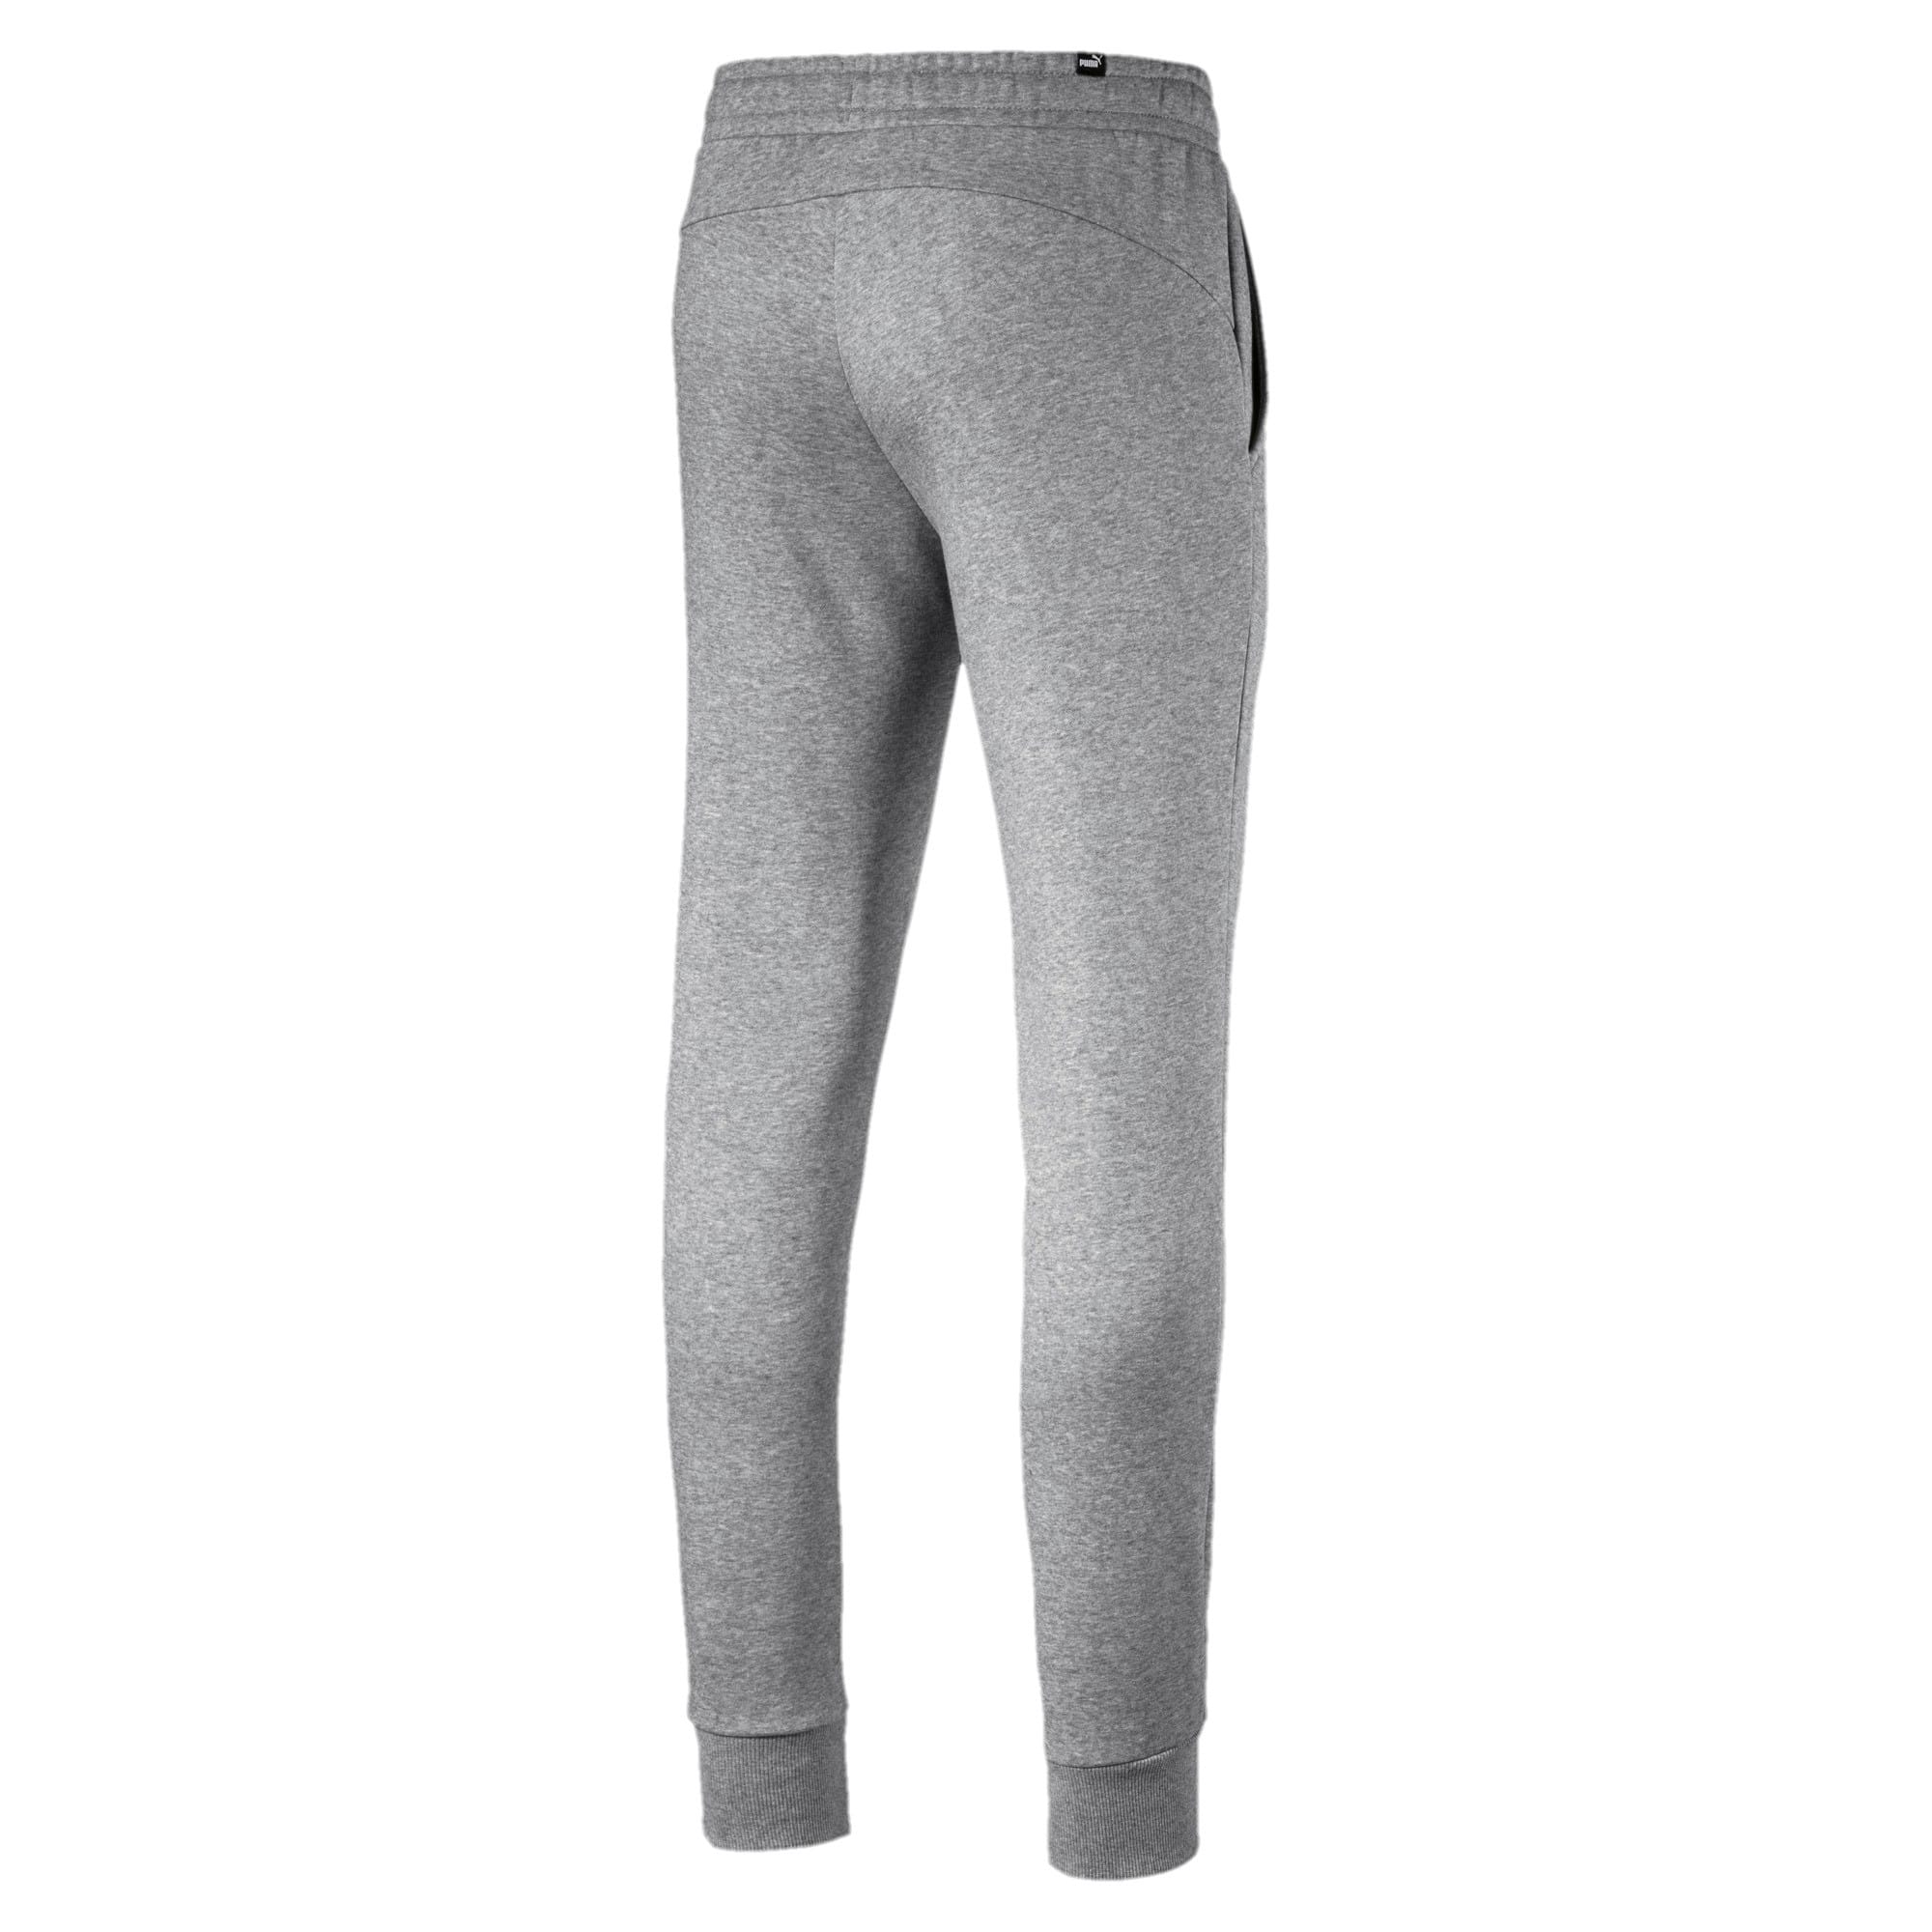 Thumbnail 3 of Essentials Men's Fleece Knit Pants, Medium Gray Heather, medium